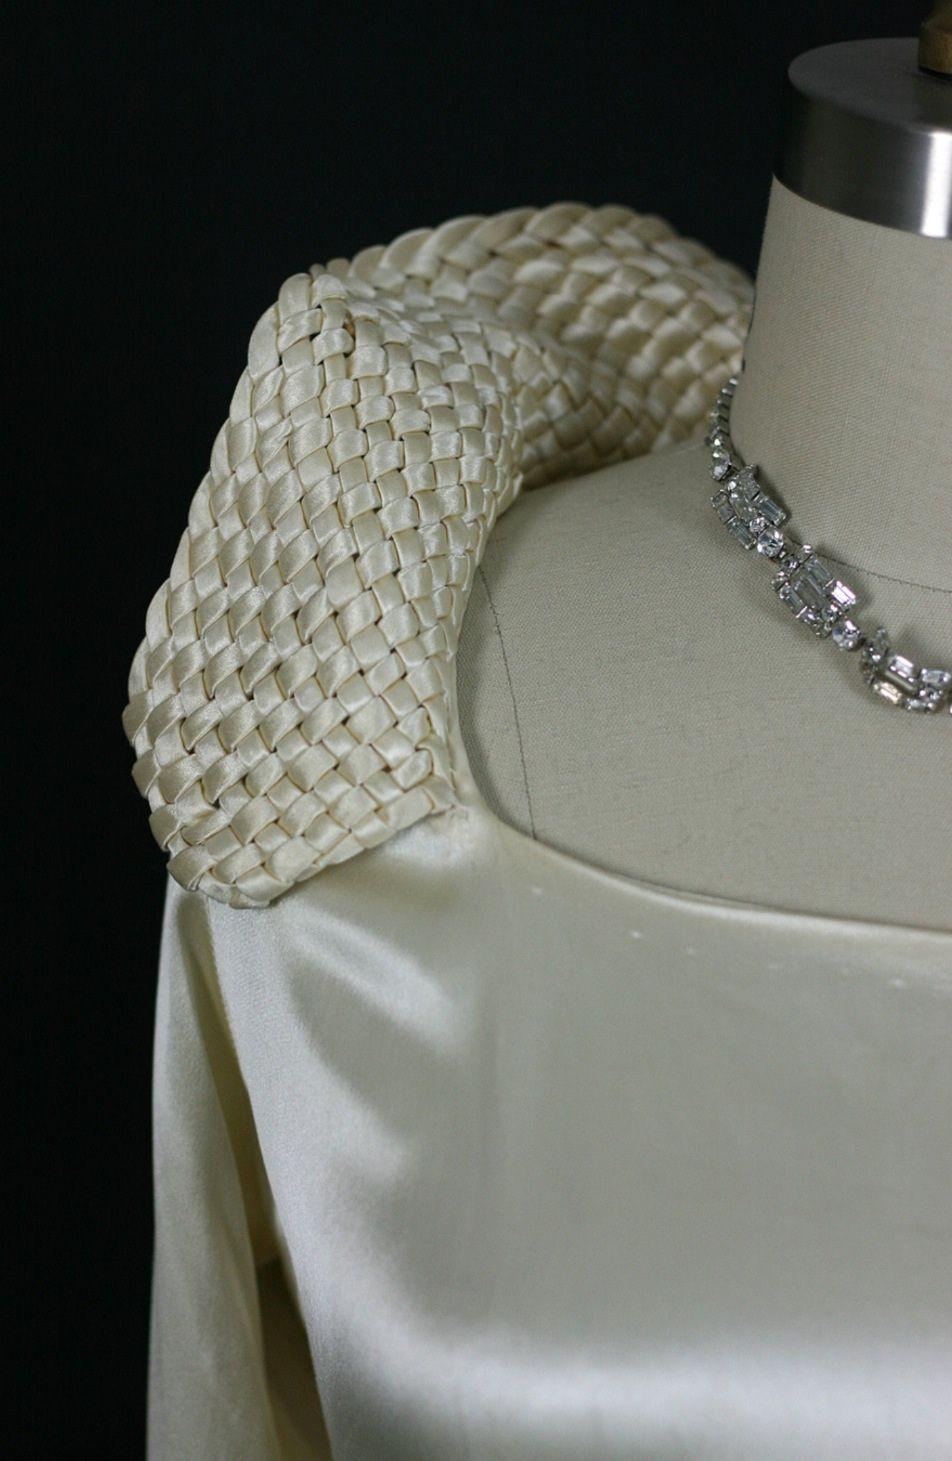 1930s wedding dress  Early s Wedding Gown  s  Pinterest  s wedding s